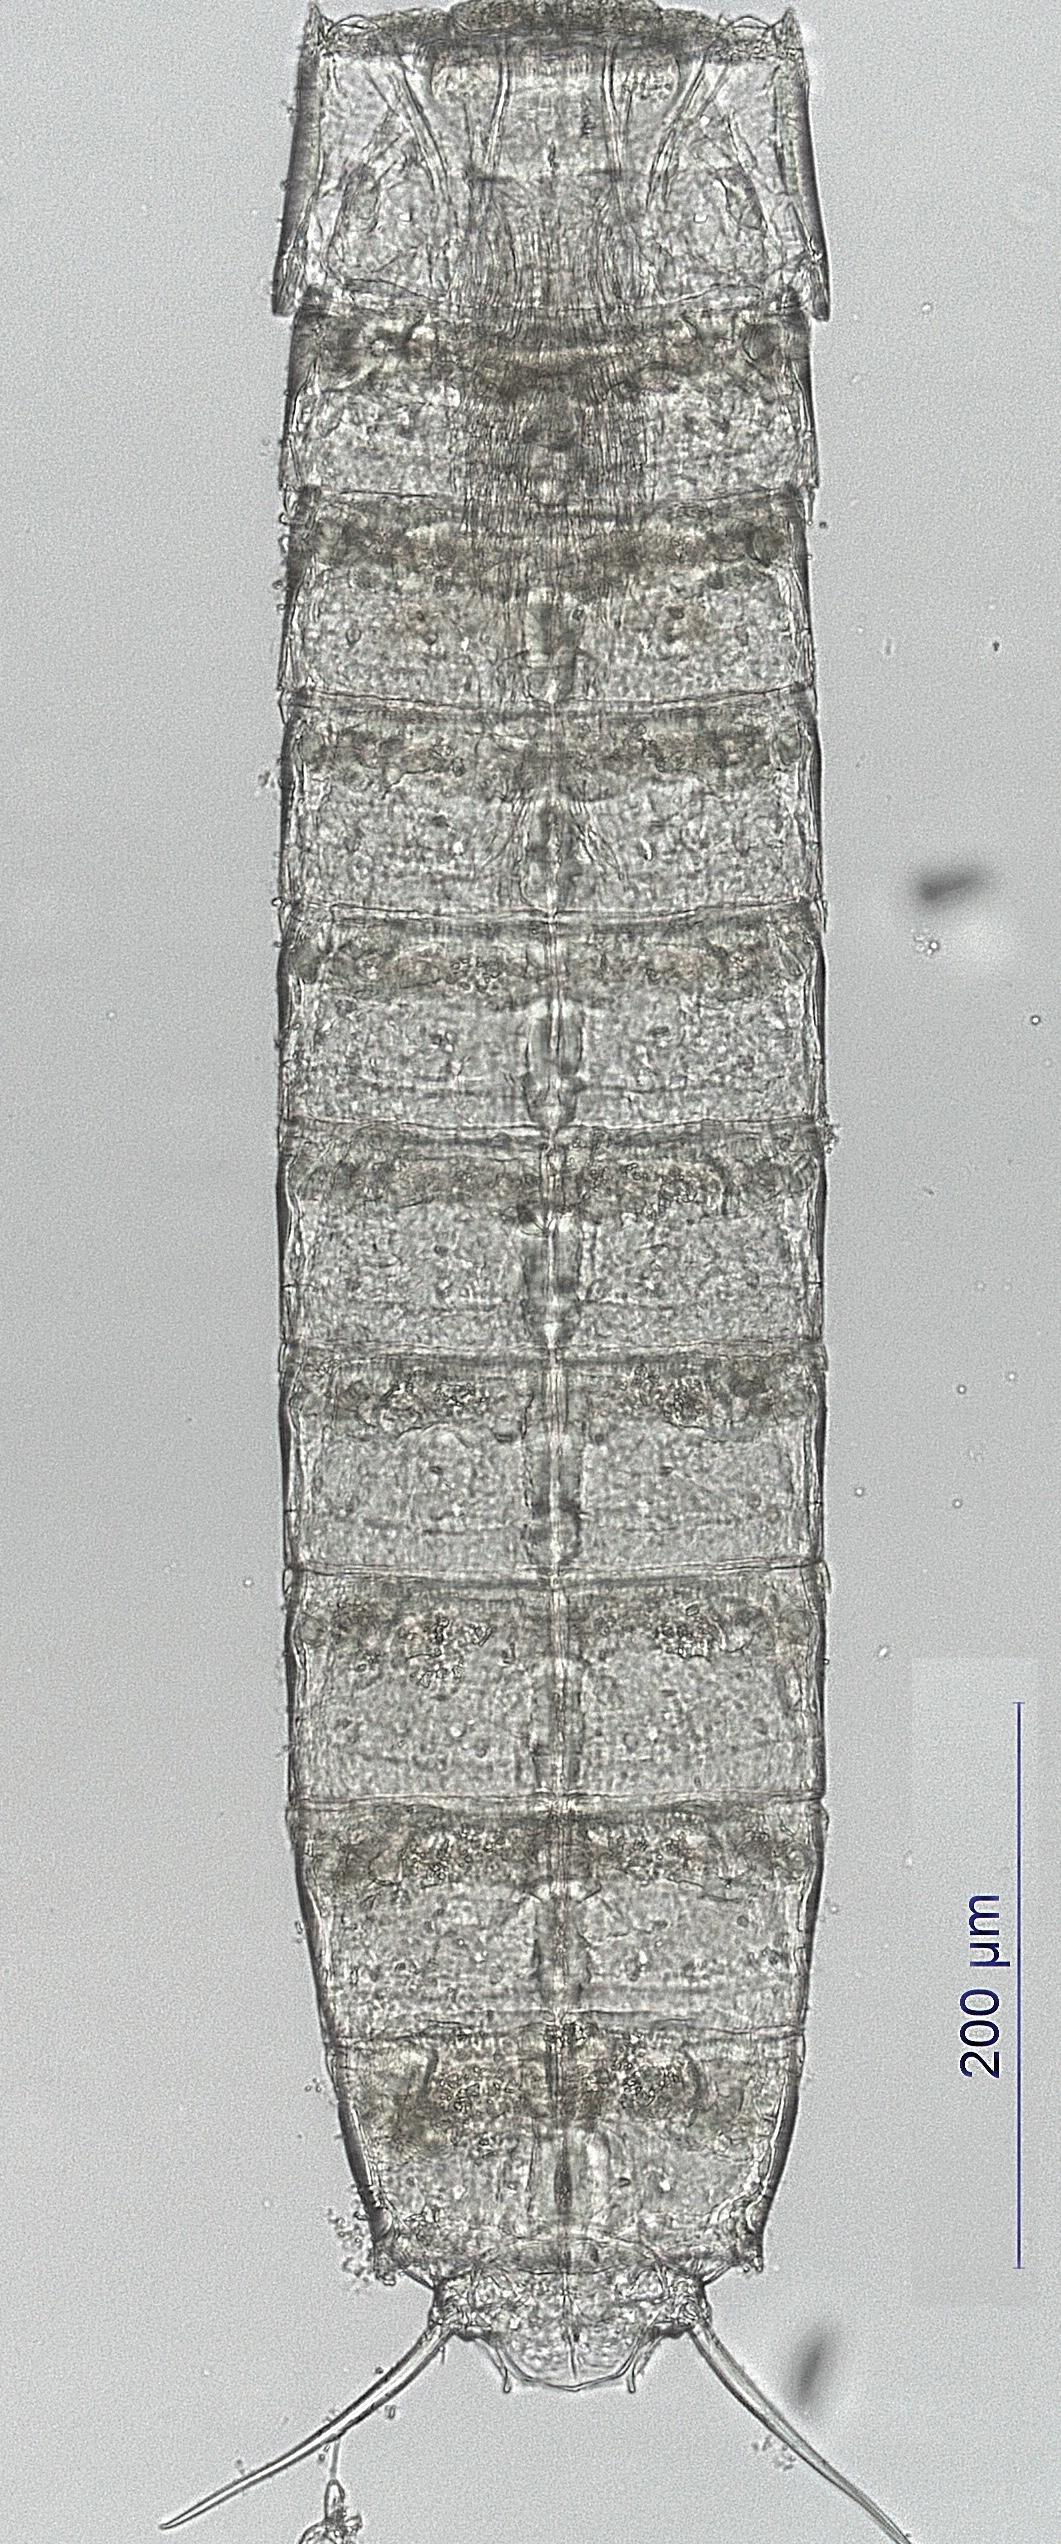 vaccino contro papilloma virus maschio